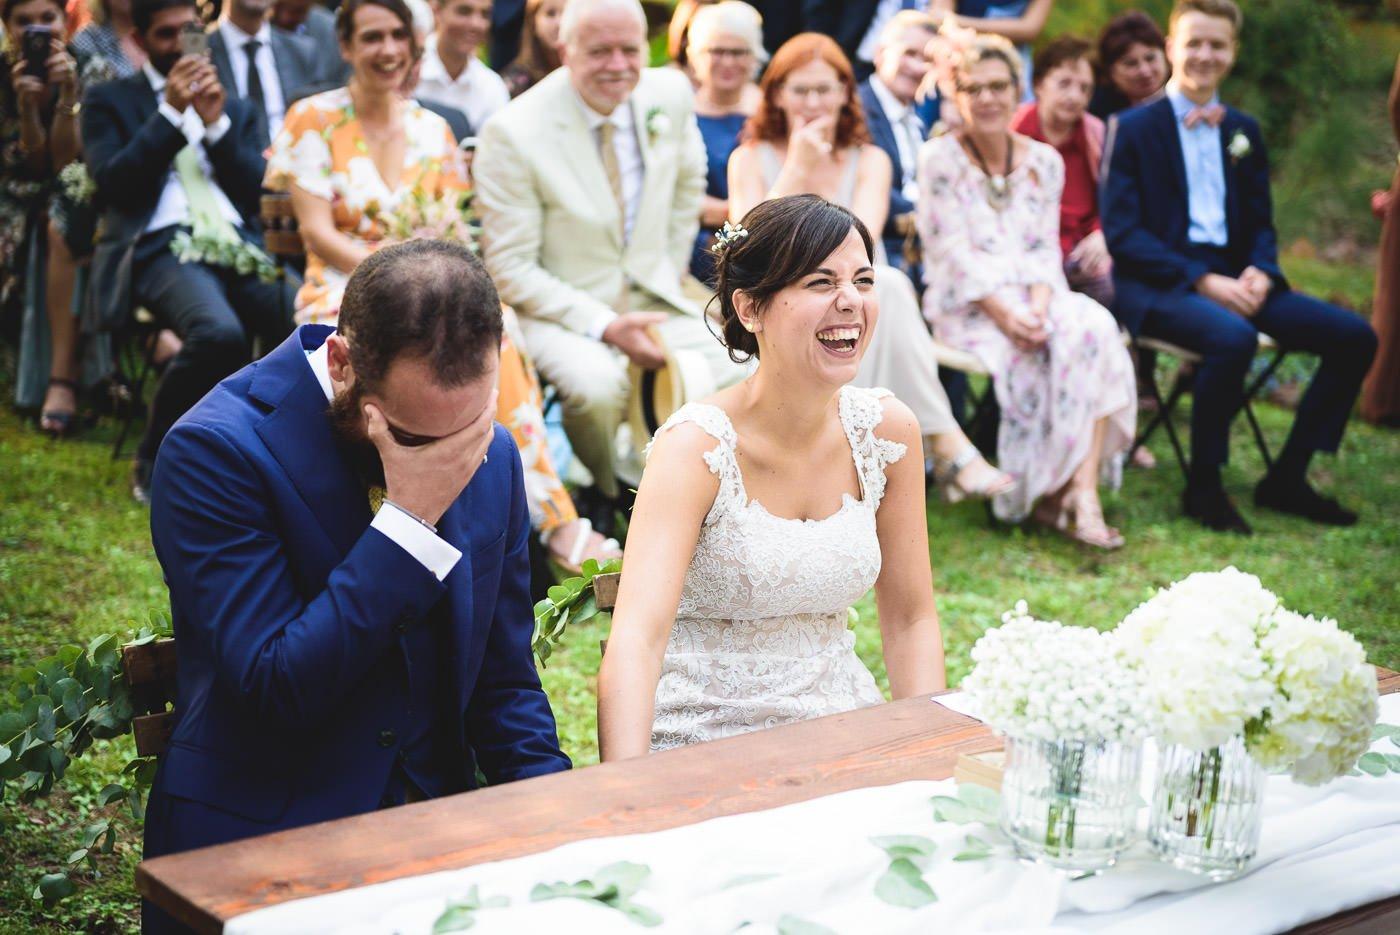 Matrimonio Giulia & Federico 09_15 – Alessio Nobili Photographer-32